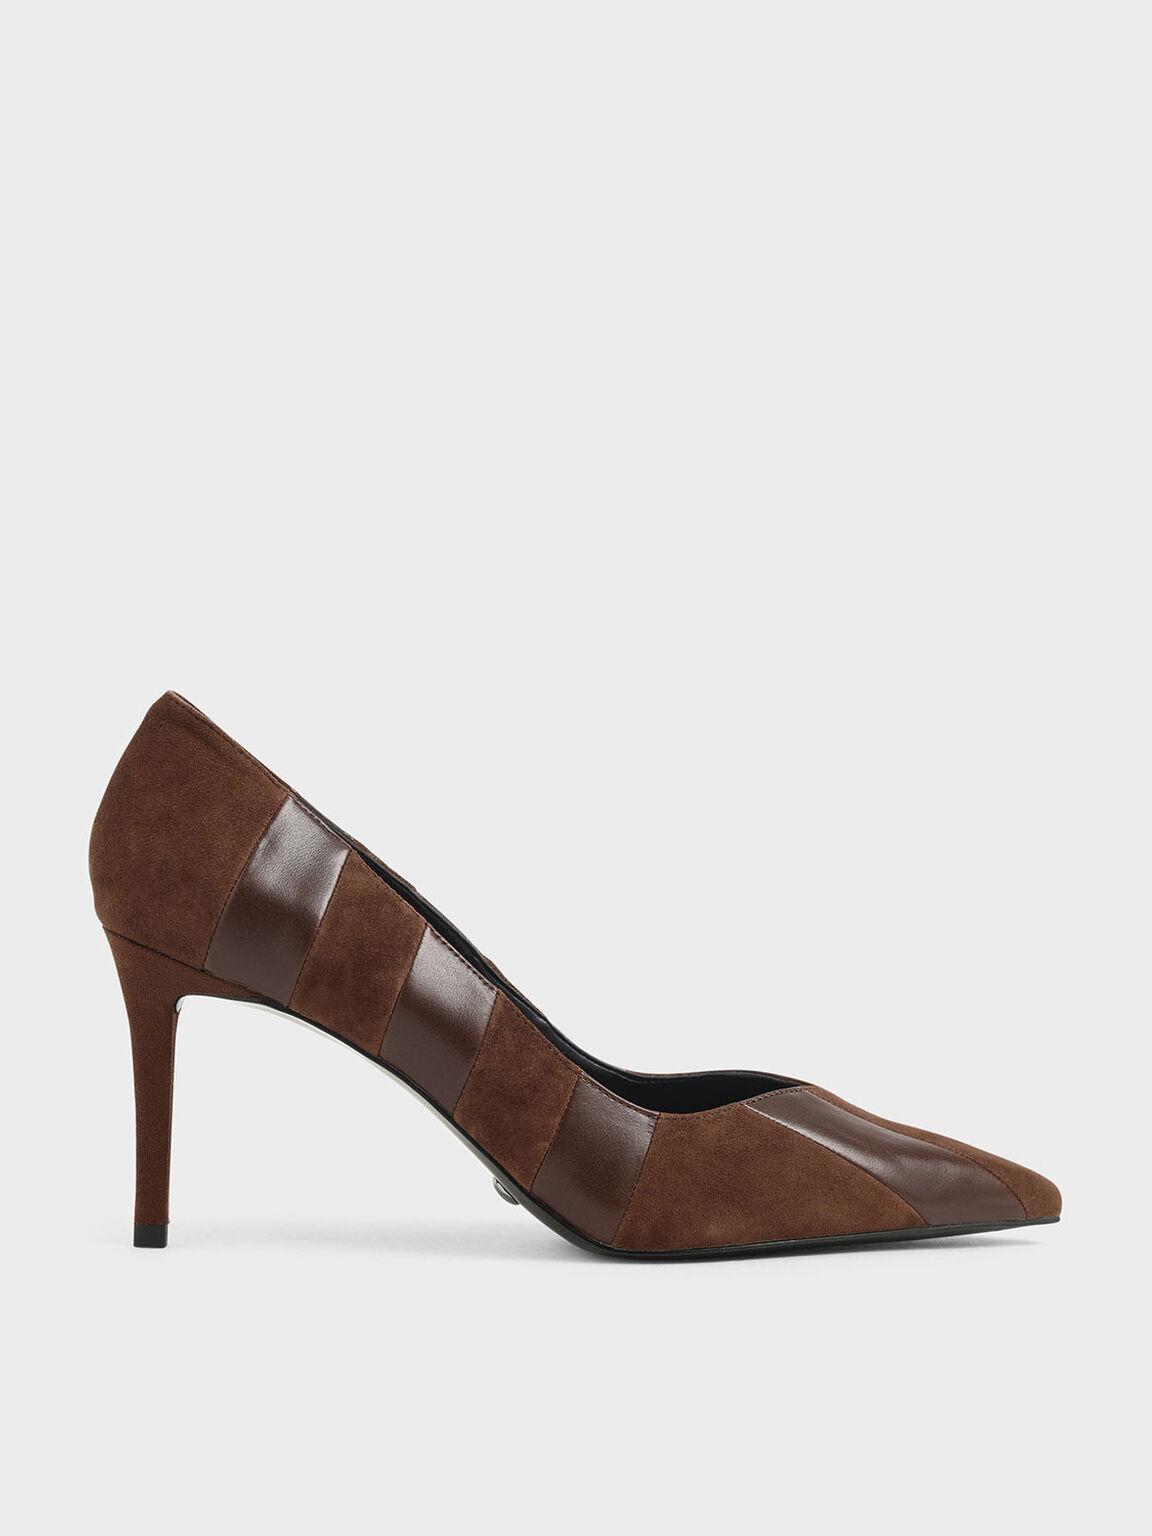 Leather Pointed Toe Pumps (Kid Suede), Cognac, hi-res